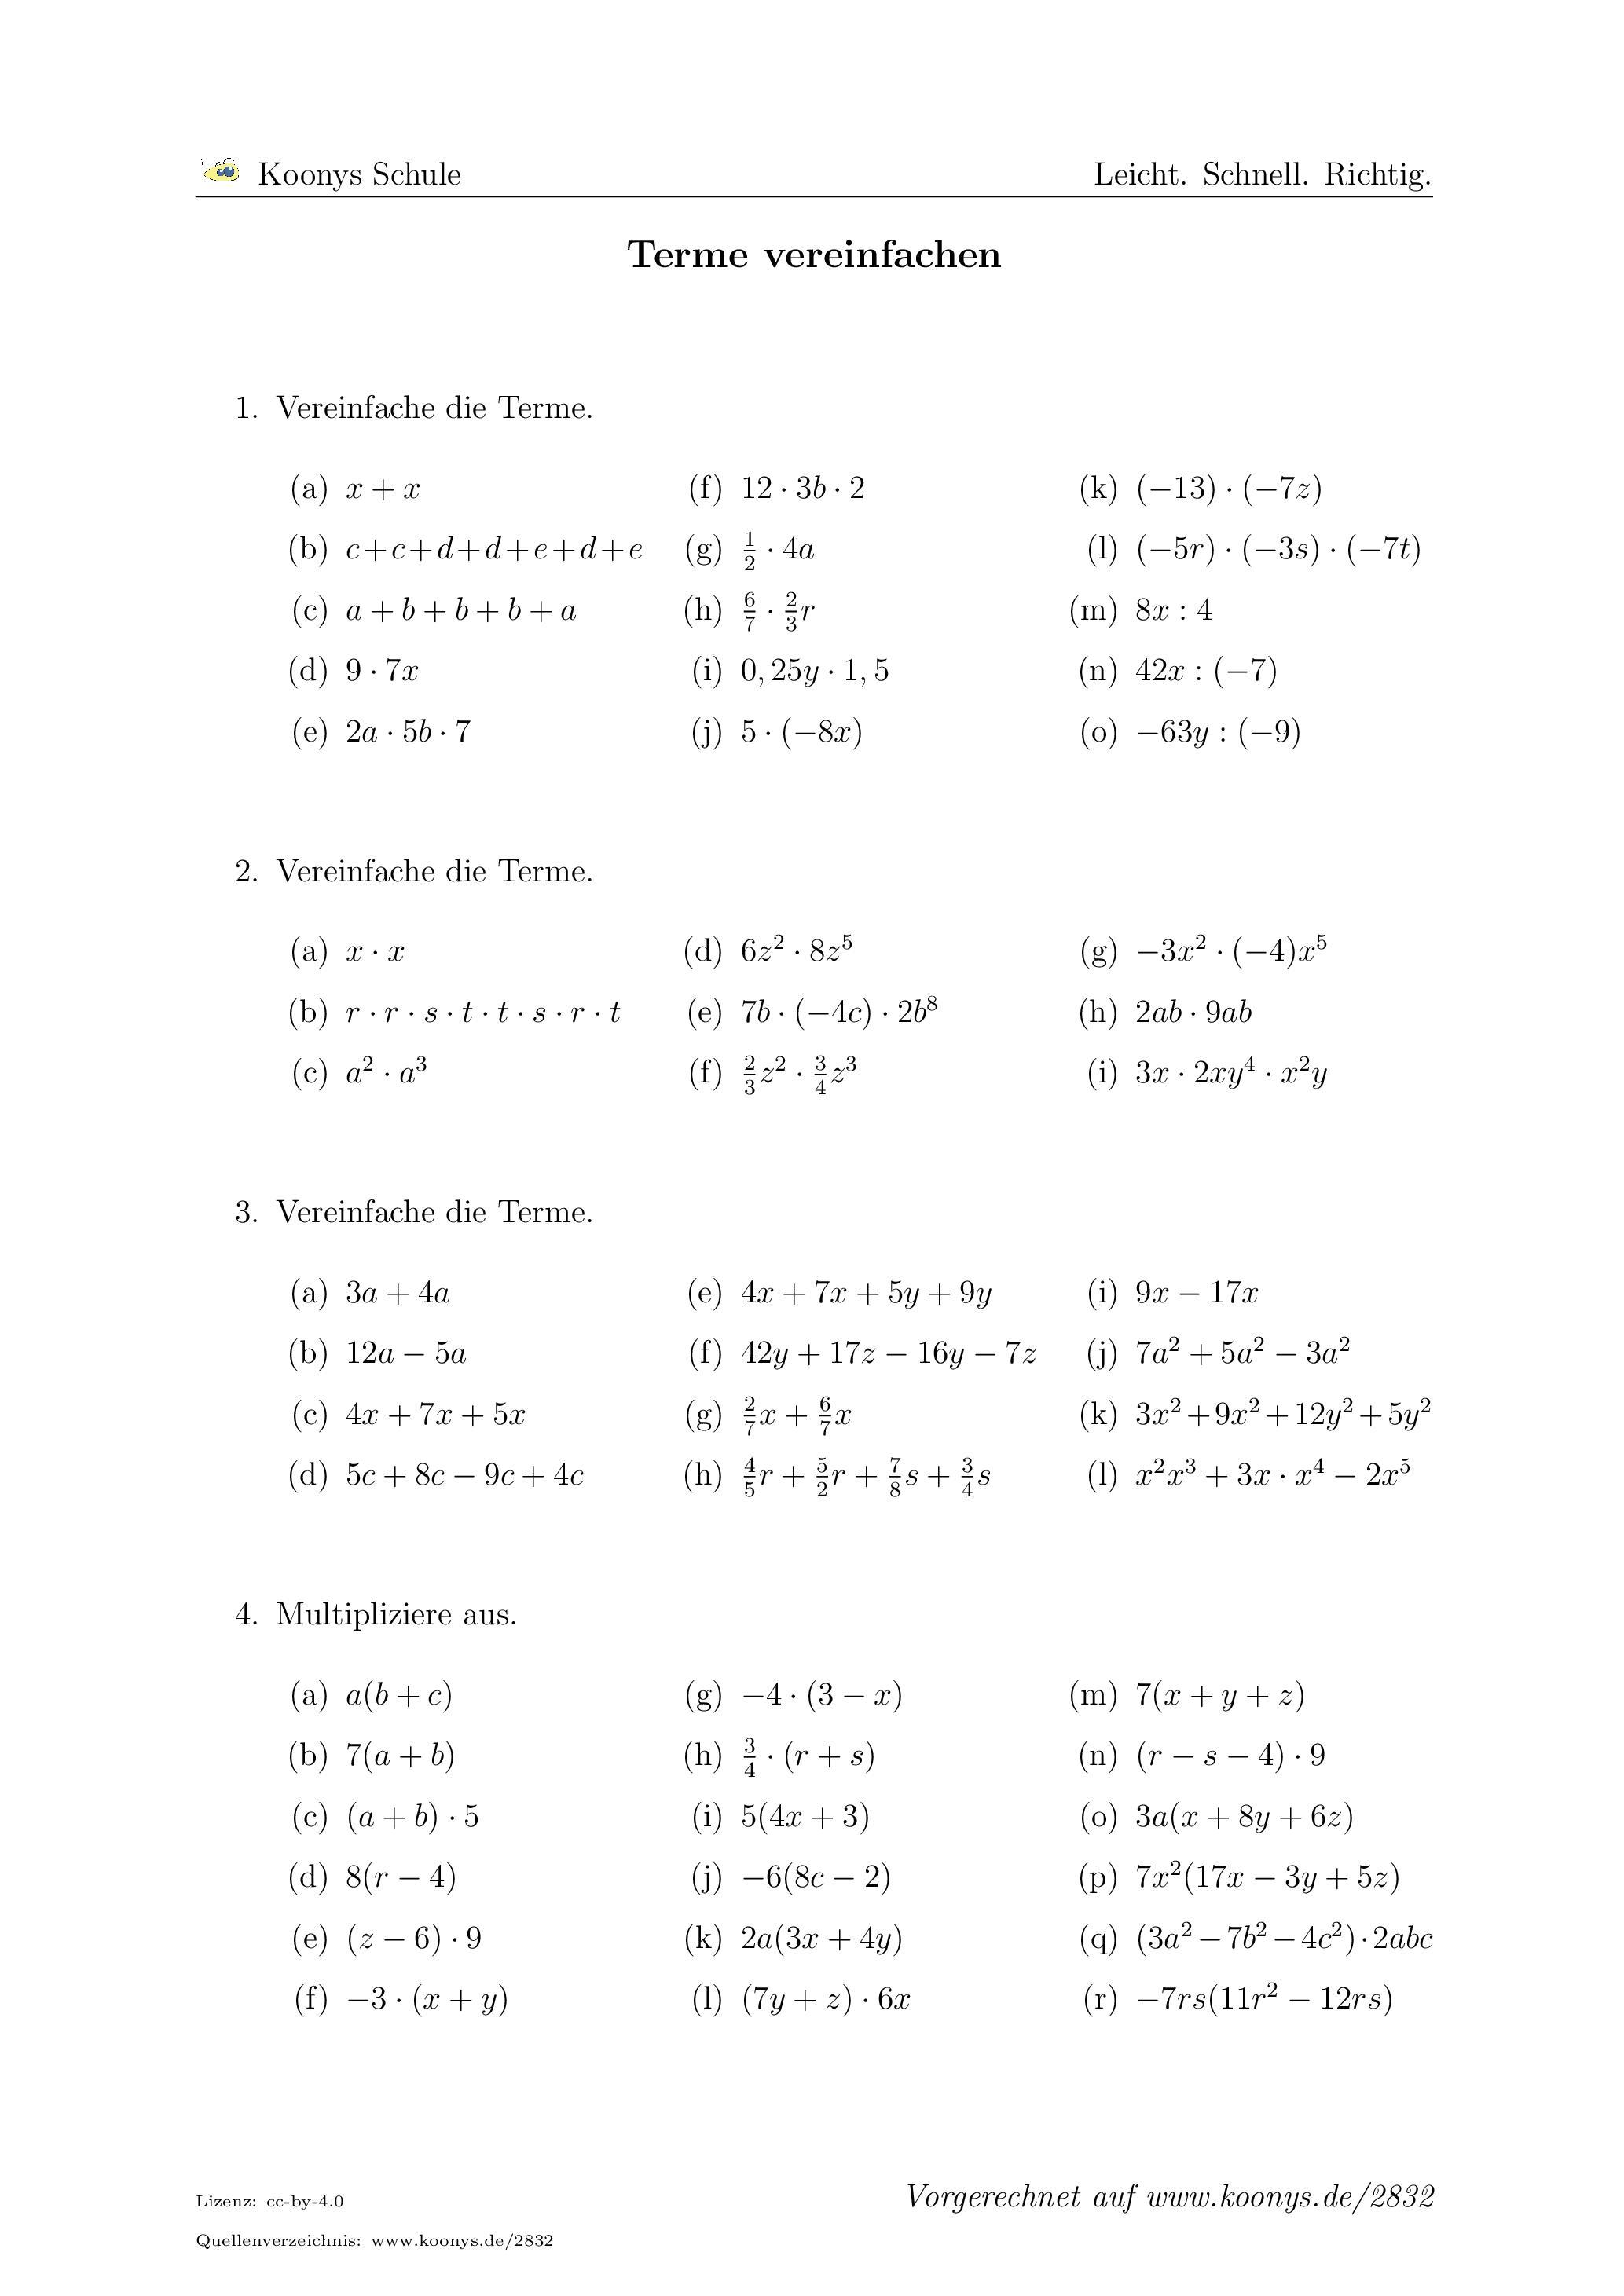 Aufgaben Terme vereinfachen mit Lösungen   Koonys Schule 20